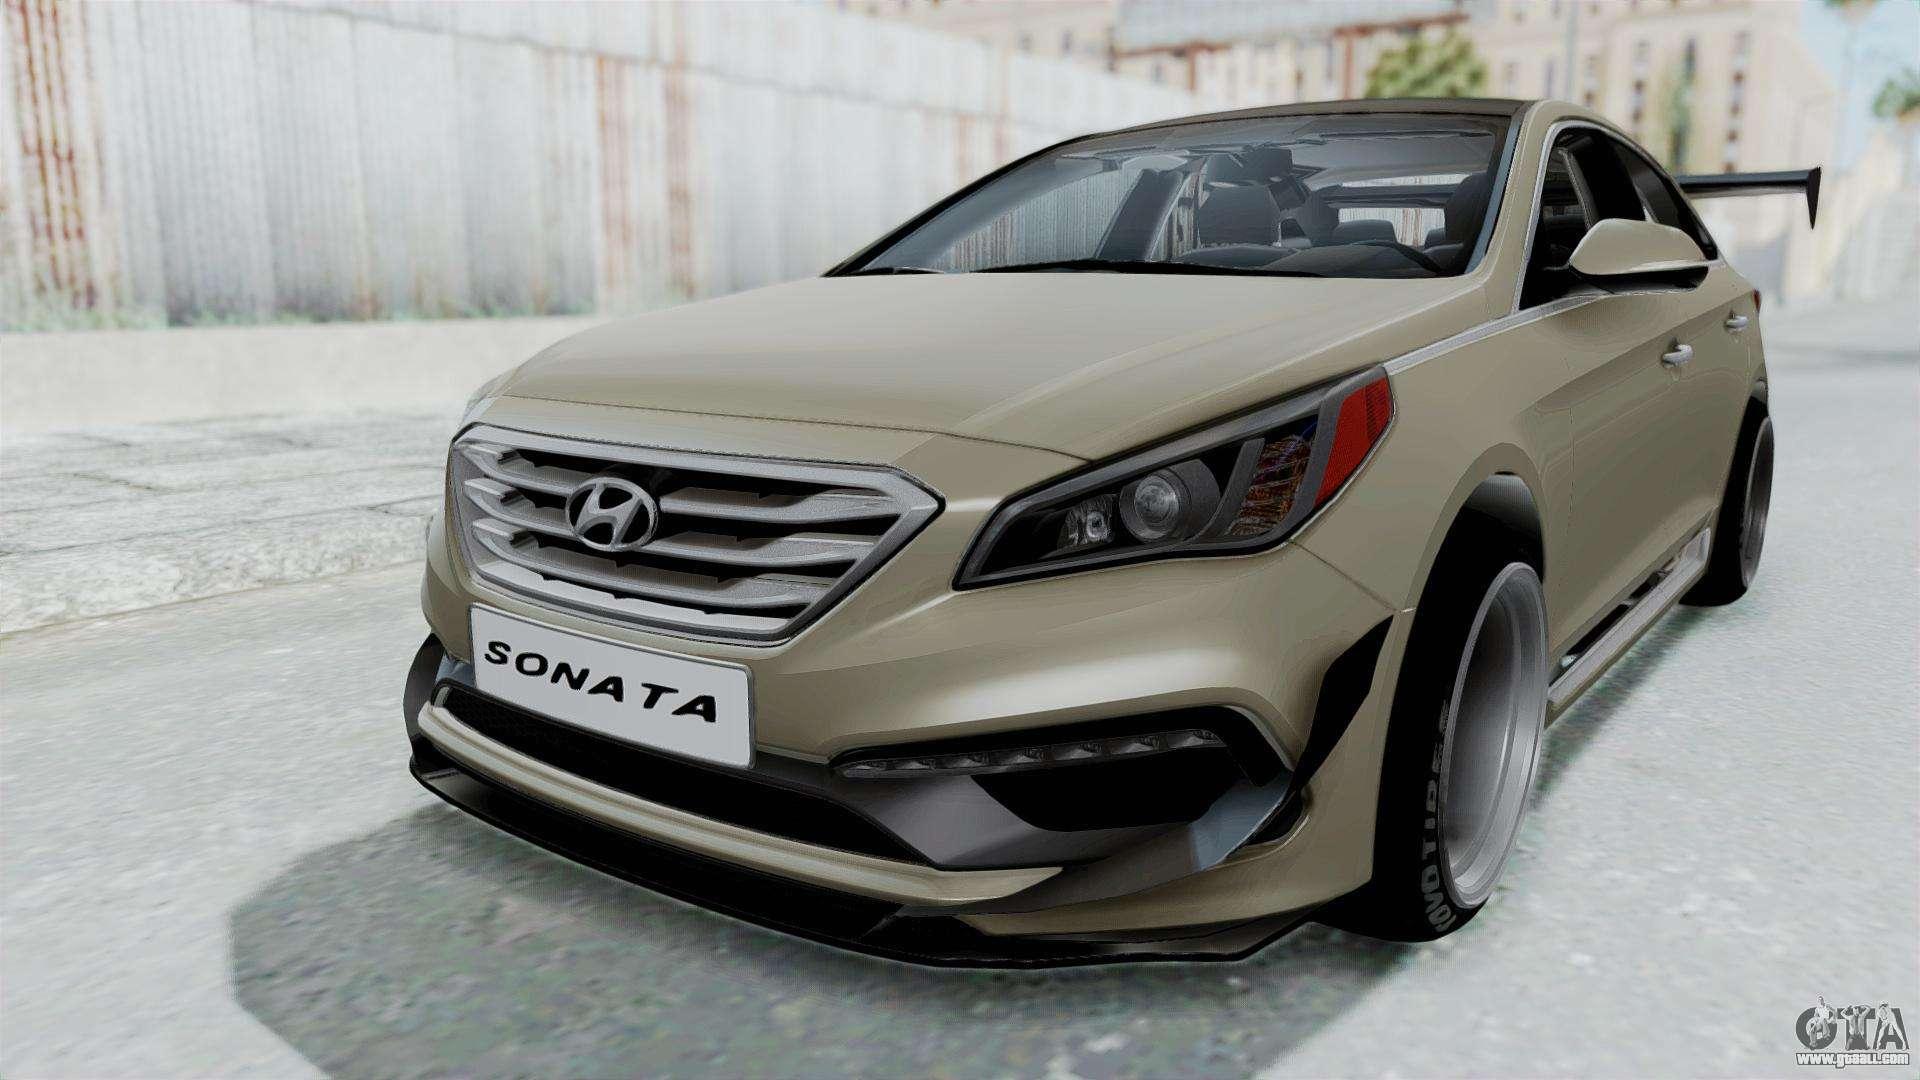 Hyundai Sonata Lf 2 0t 2015 V1 0 Rocket Bunny For Gta San